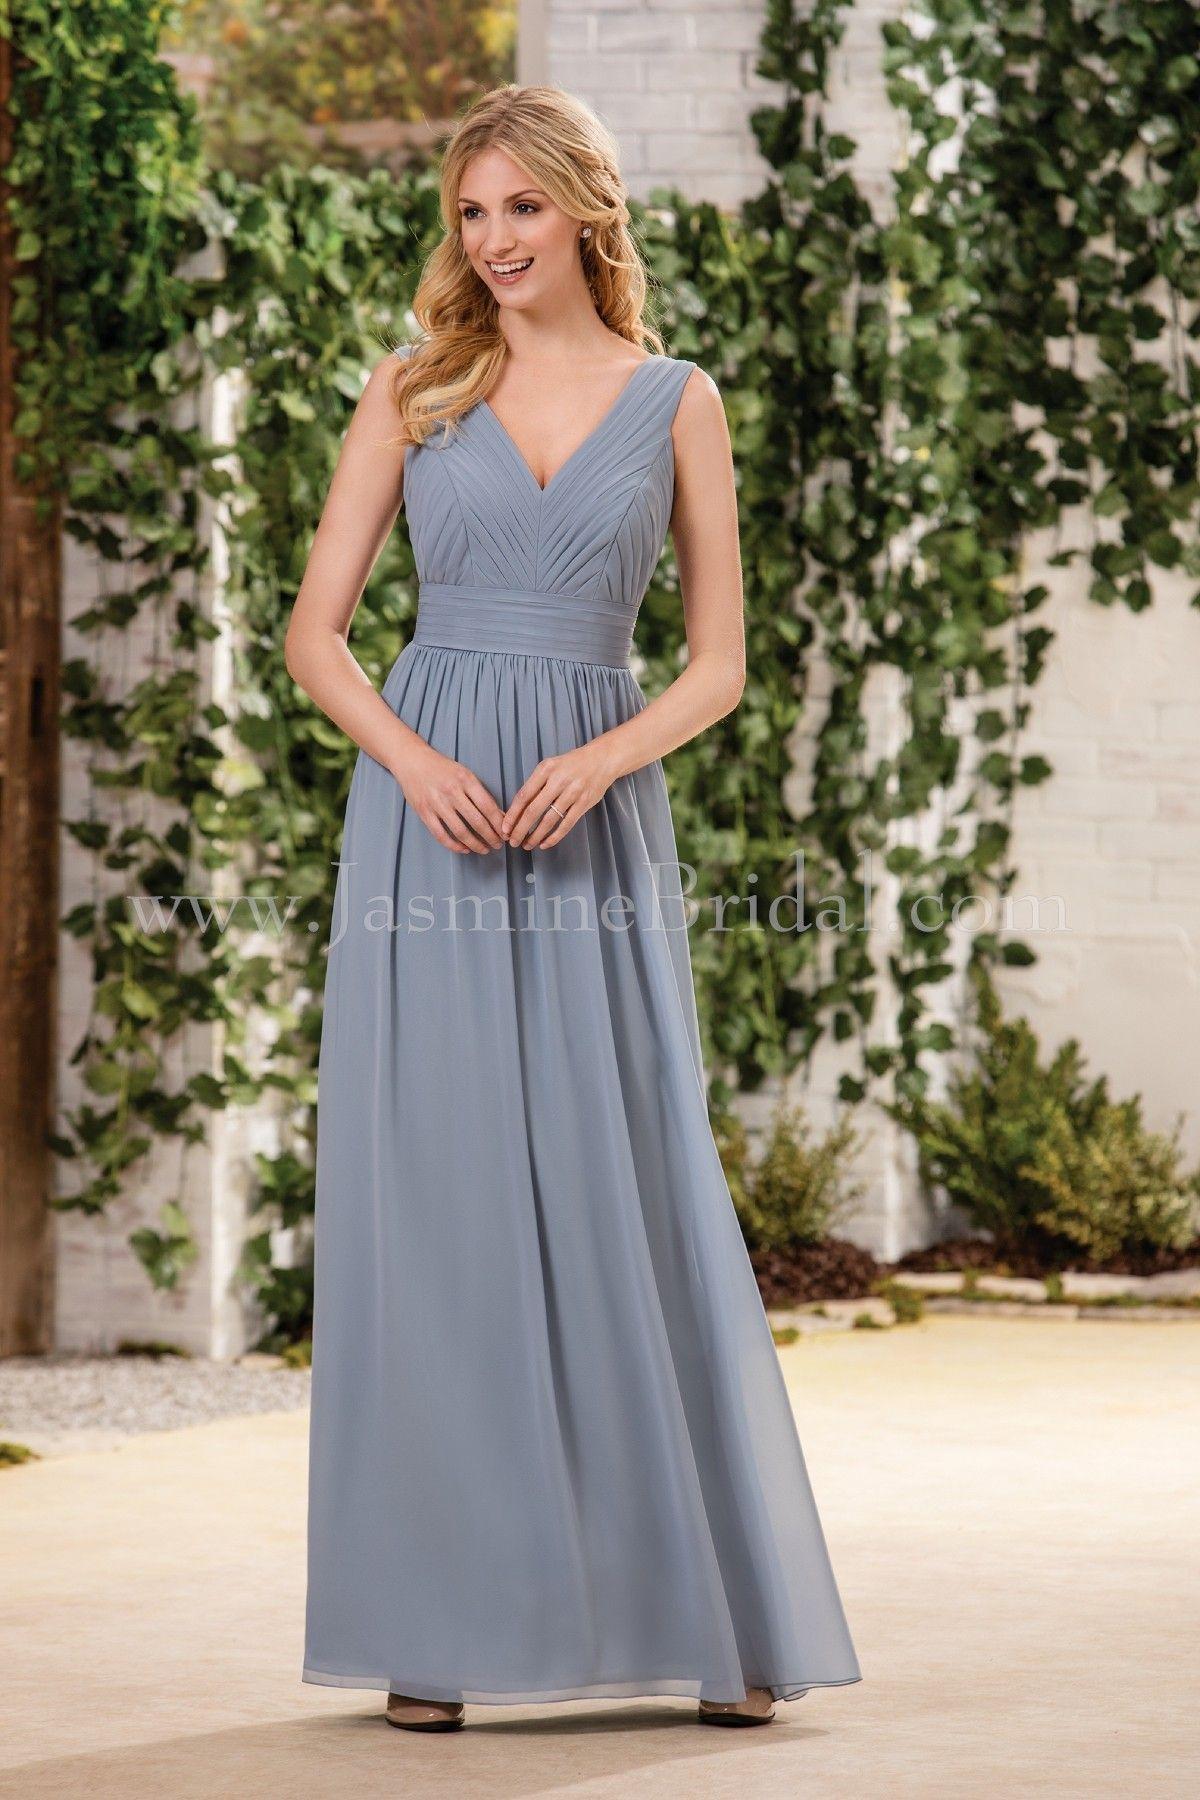 Jasmine bridal bridesmaid dress b2 style b183056 in cornflower jasmine bridal bridesmaid dress b2 style b183056 in cornflower ombrellifo Images